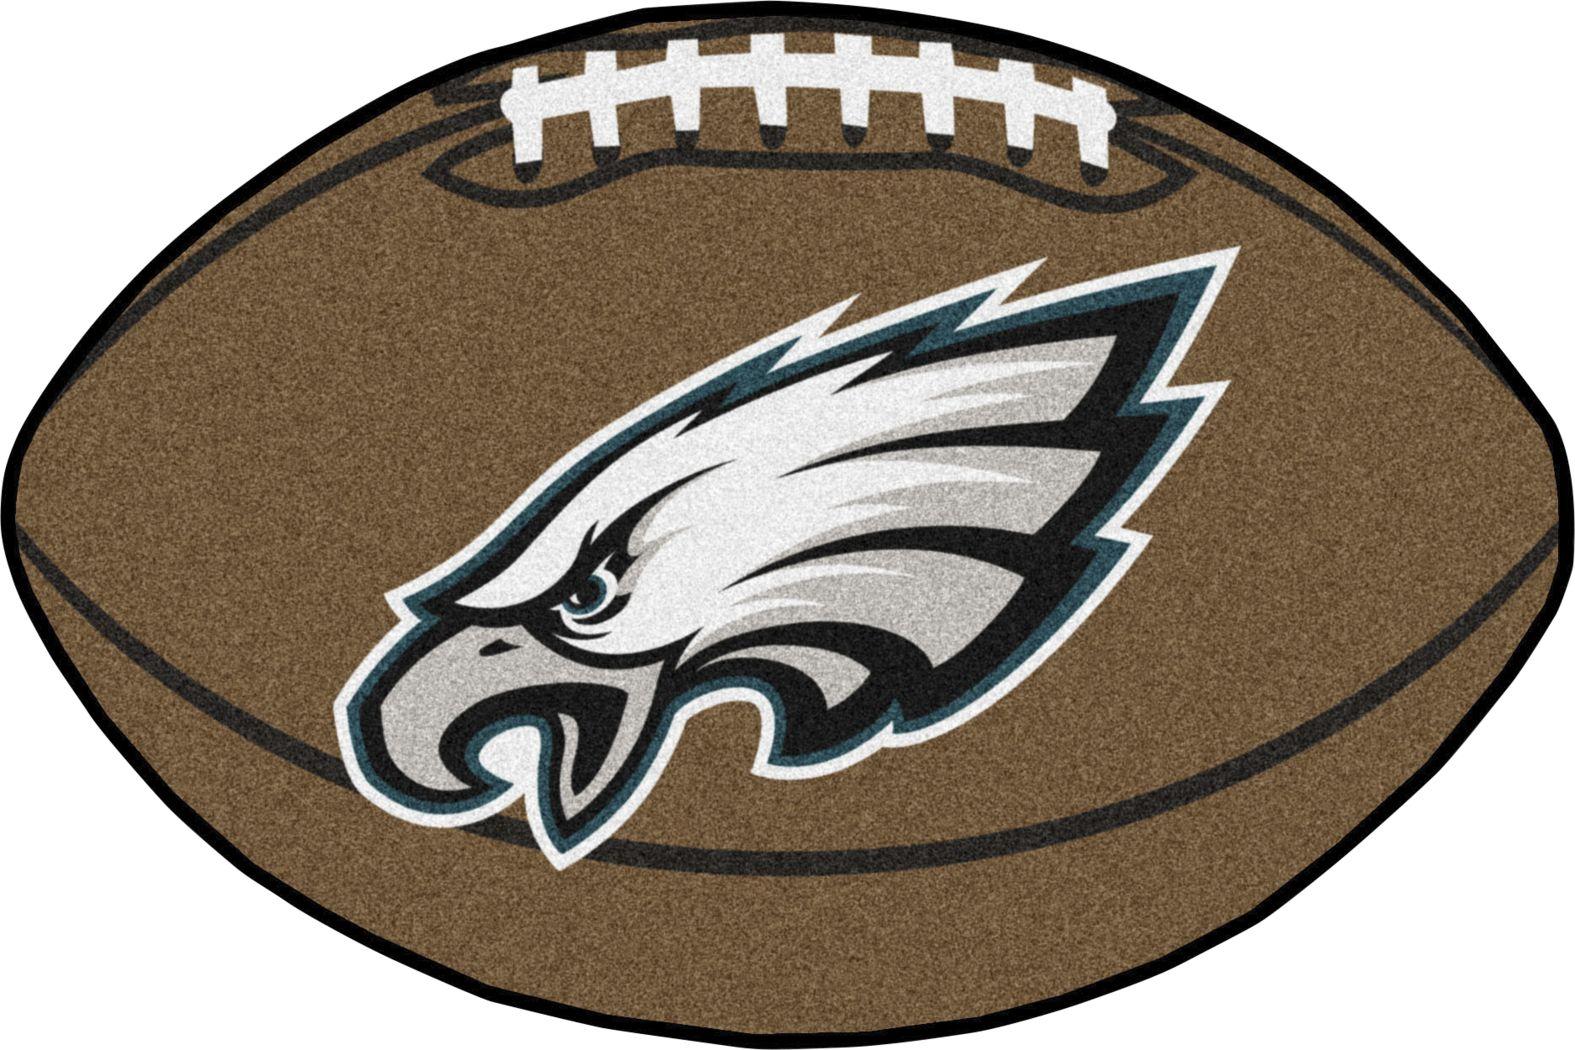 "NFL Football Mascot Philadelphia Eagles 1'6"" x 1'10"" Rug"